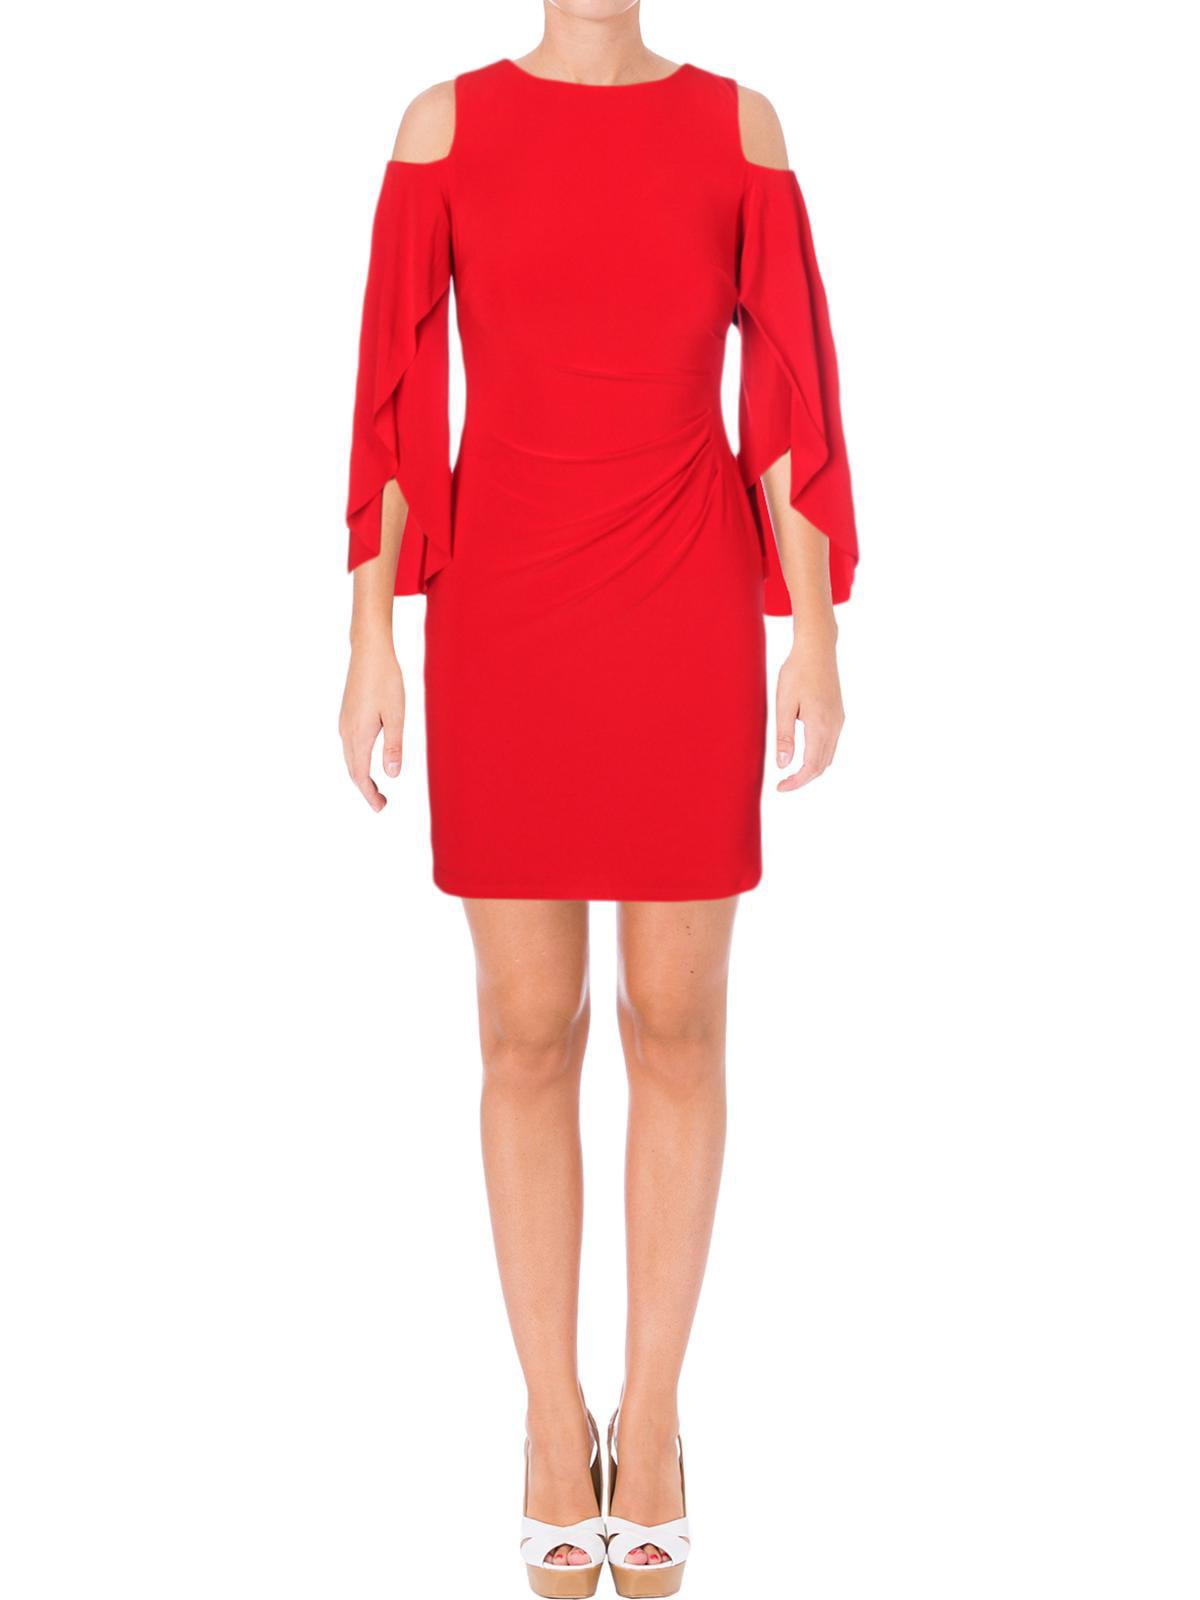 Lauren Ralph Lauren Womens Petites Debbie Cold Shoulder Cocktail Dress